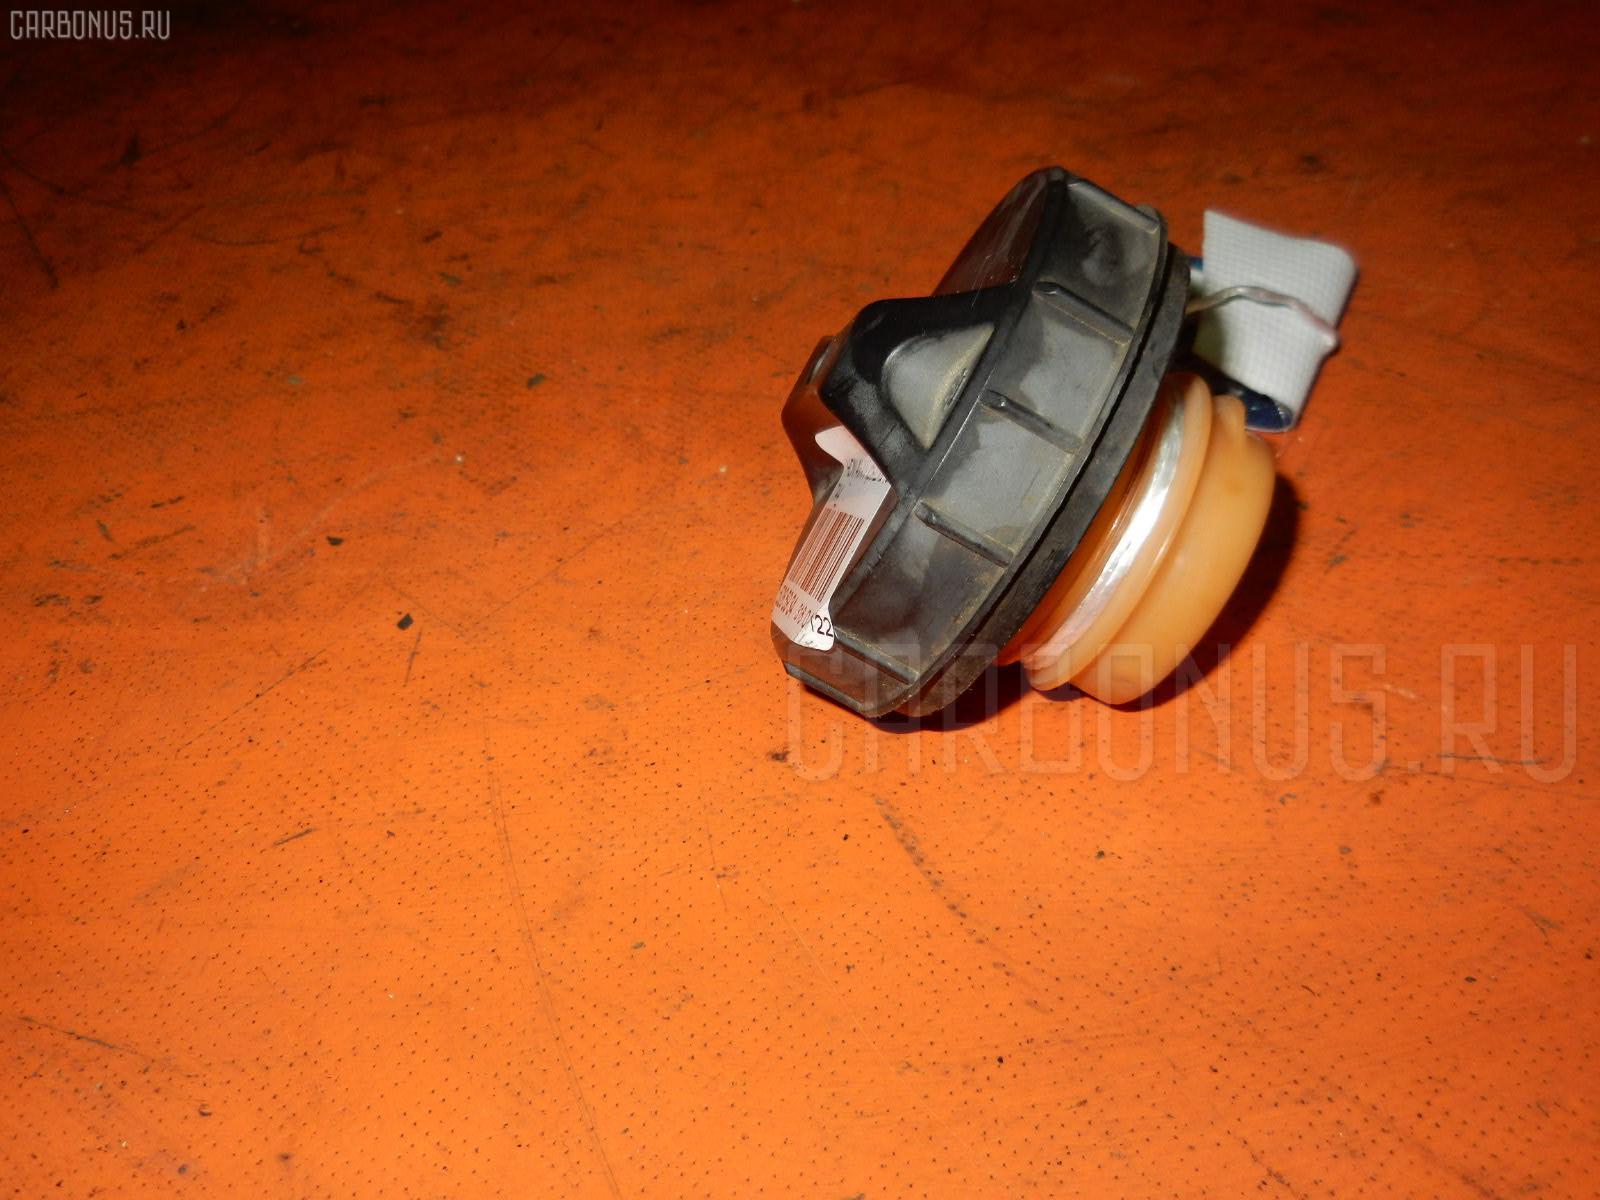 Крышка топливного бака HONDA AVANCIER TA4 Фото 1